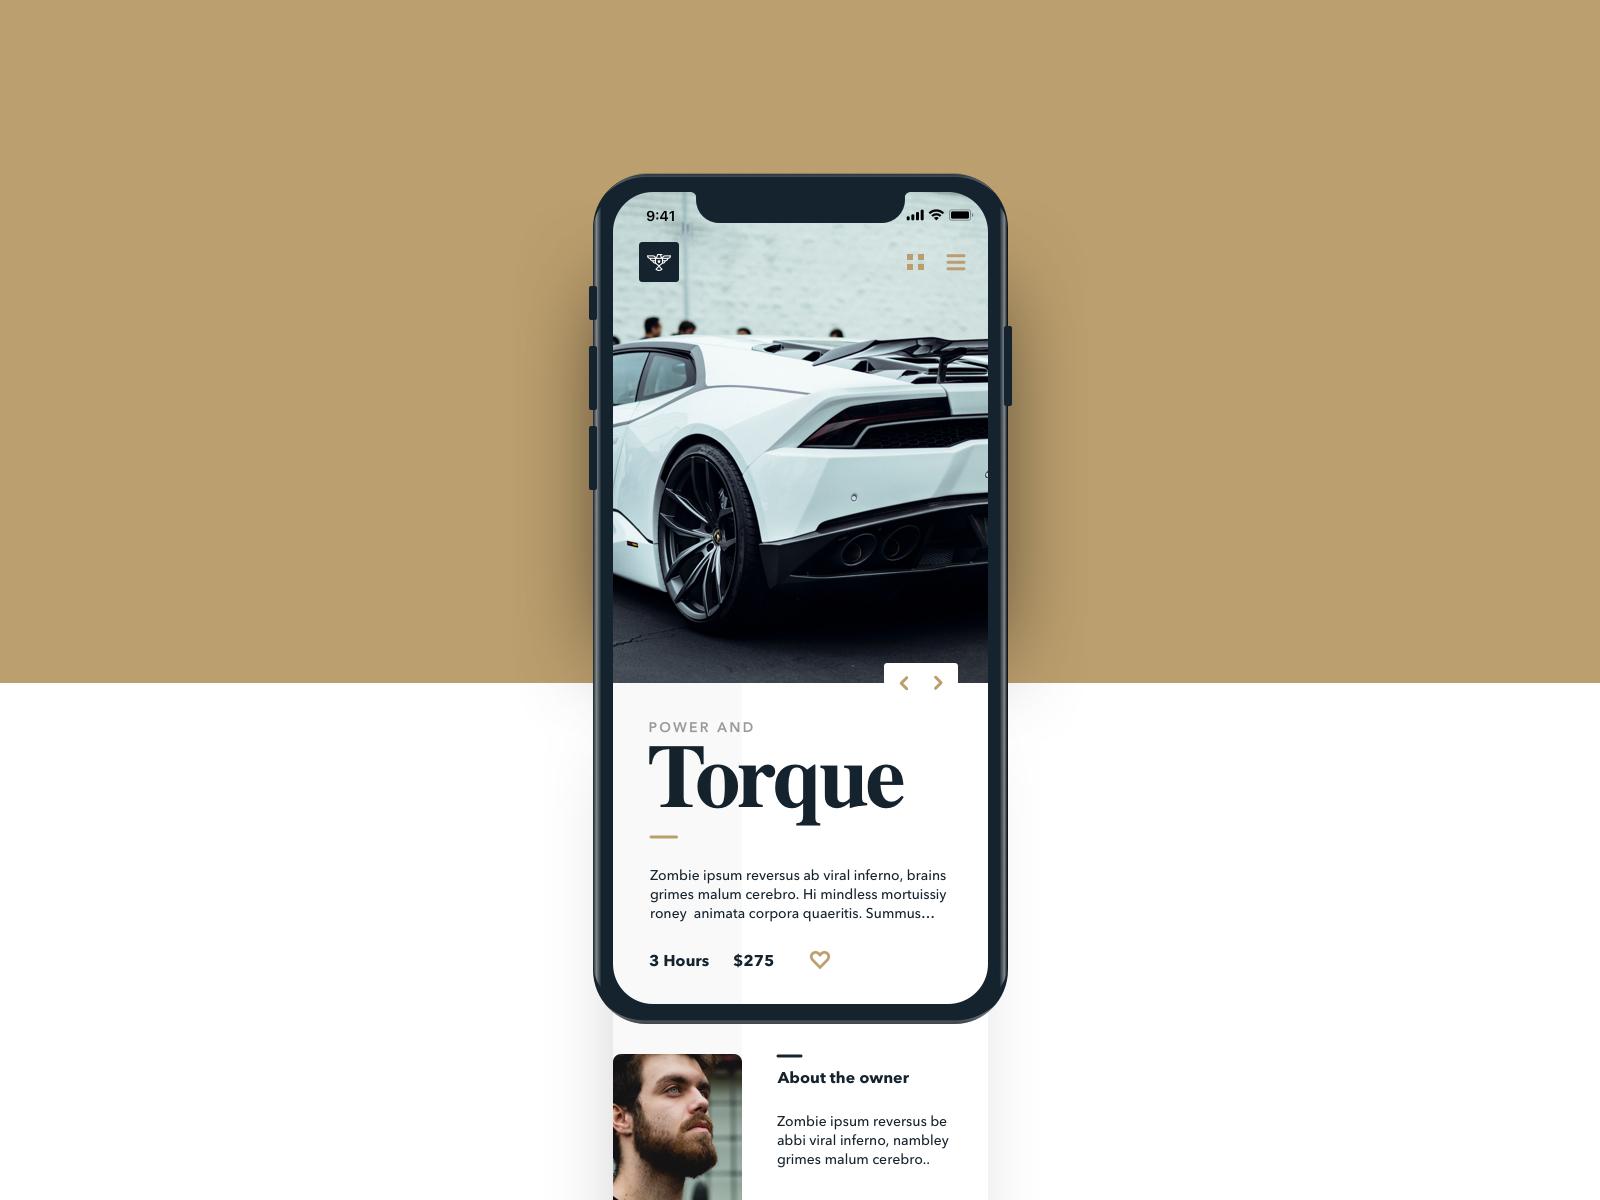 torque_mobile_4x.jpg